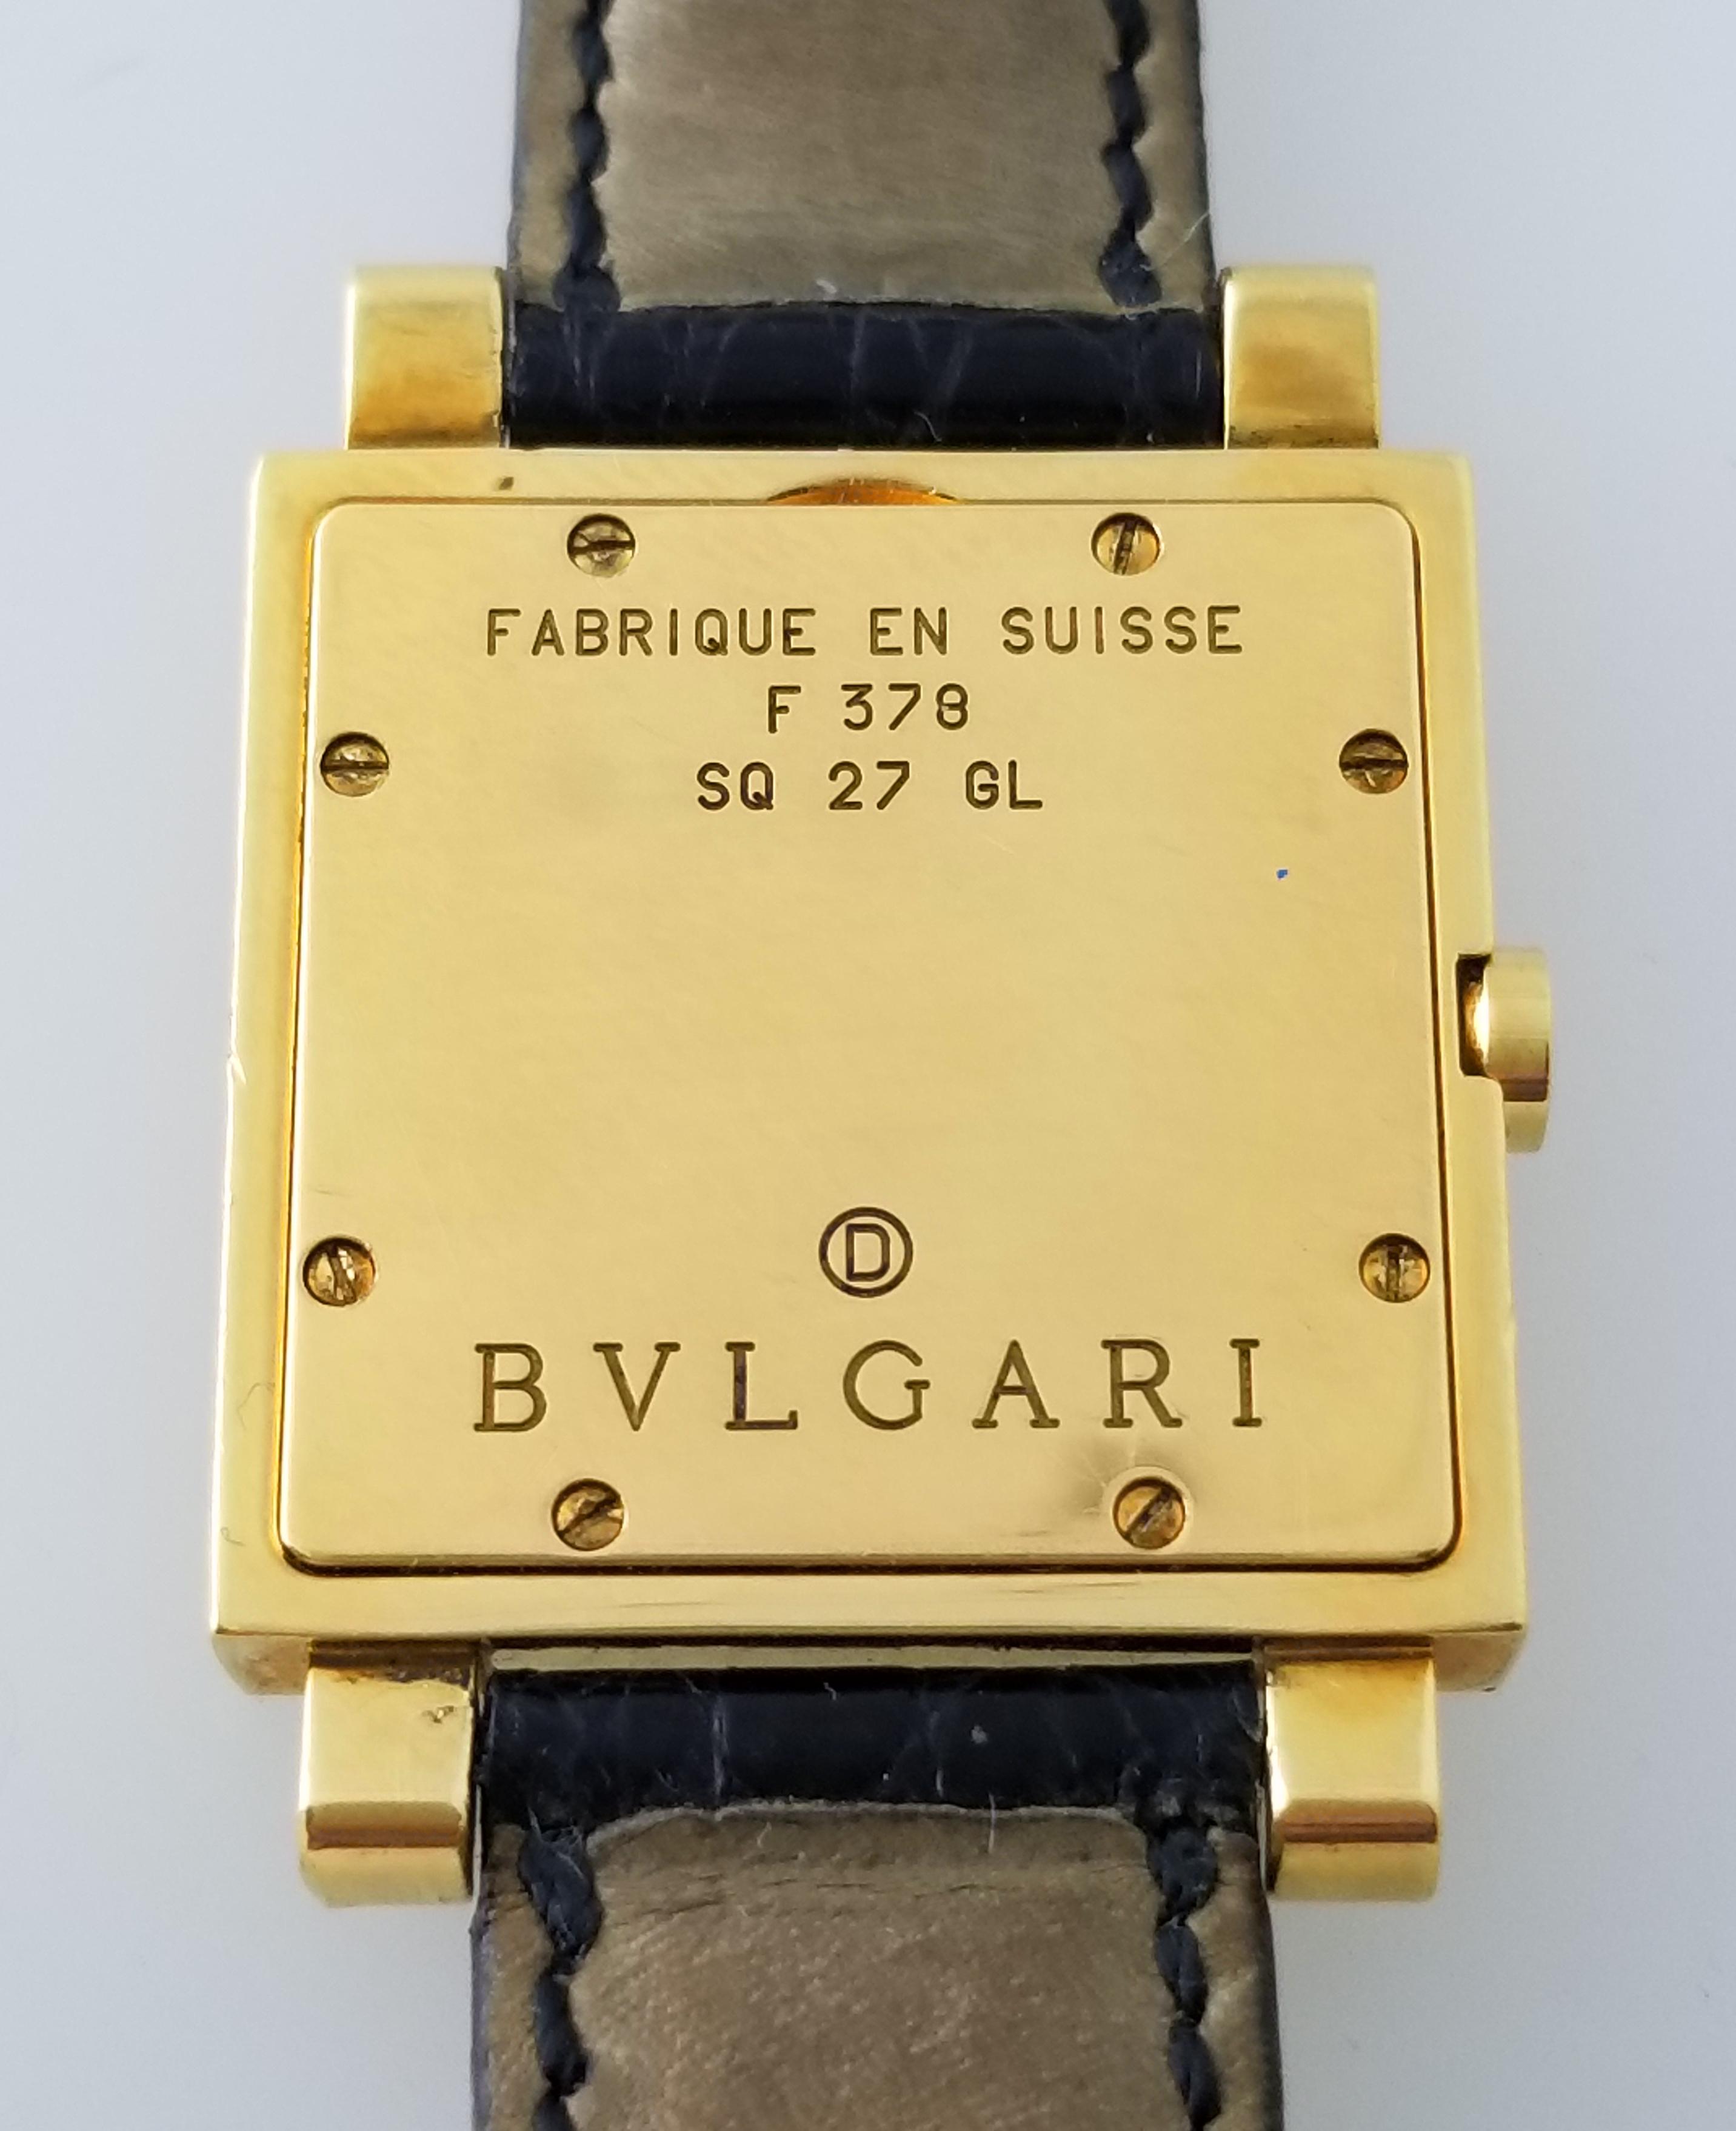 841ac1e97ca Bulgari Quadrato SQ27GL 27mm 18k Yellow Gold Black Dial Date Quartz Watch